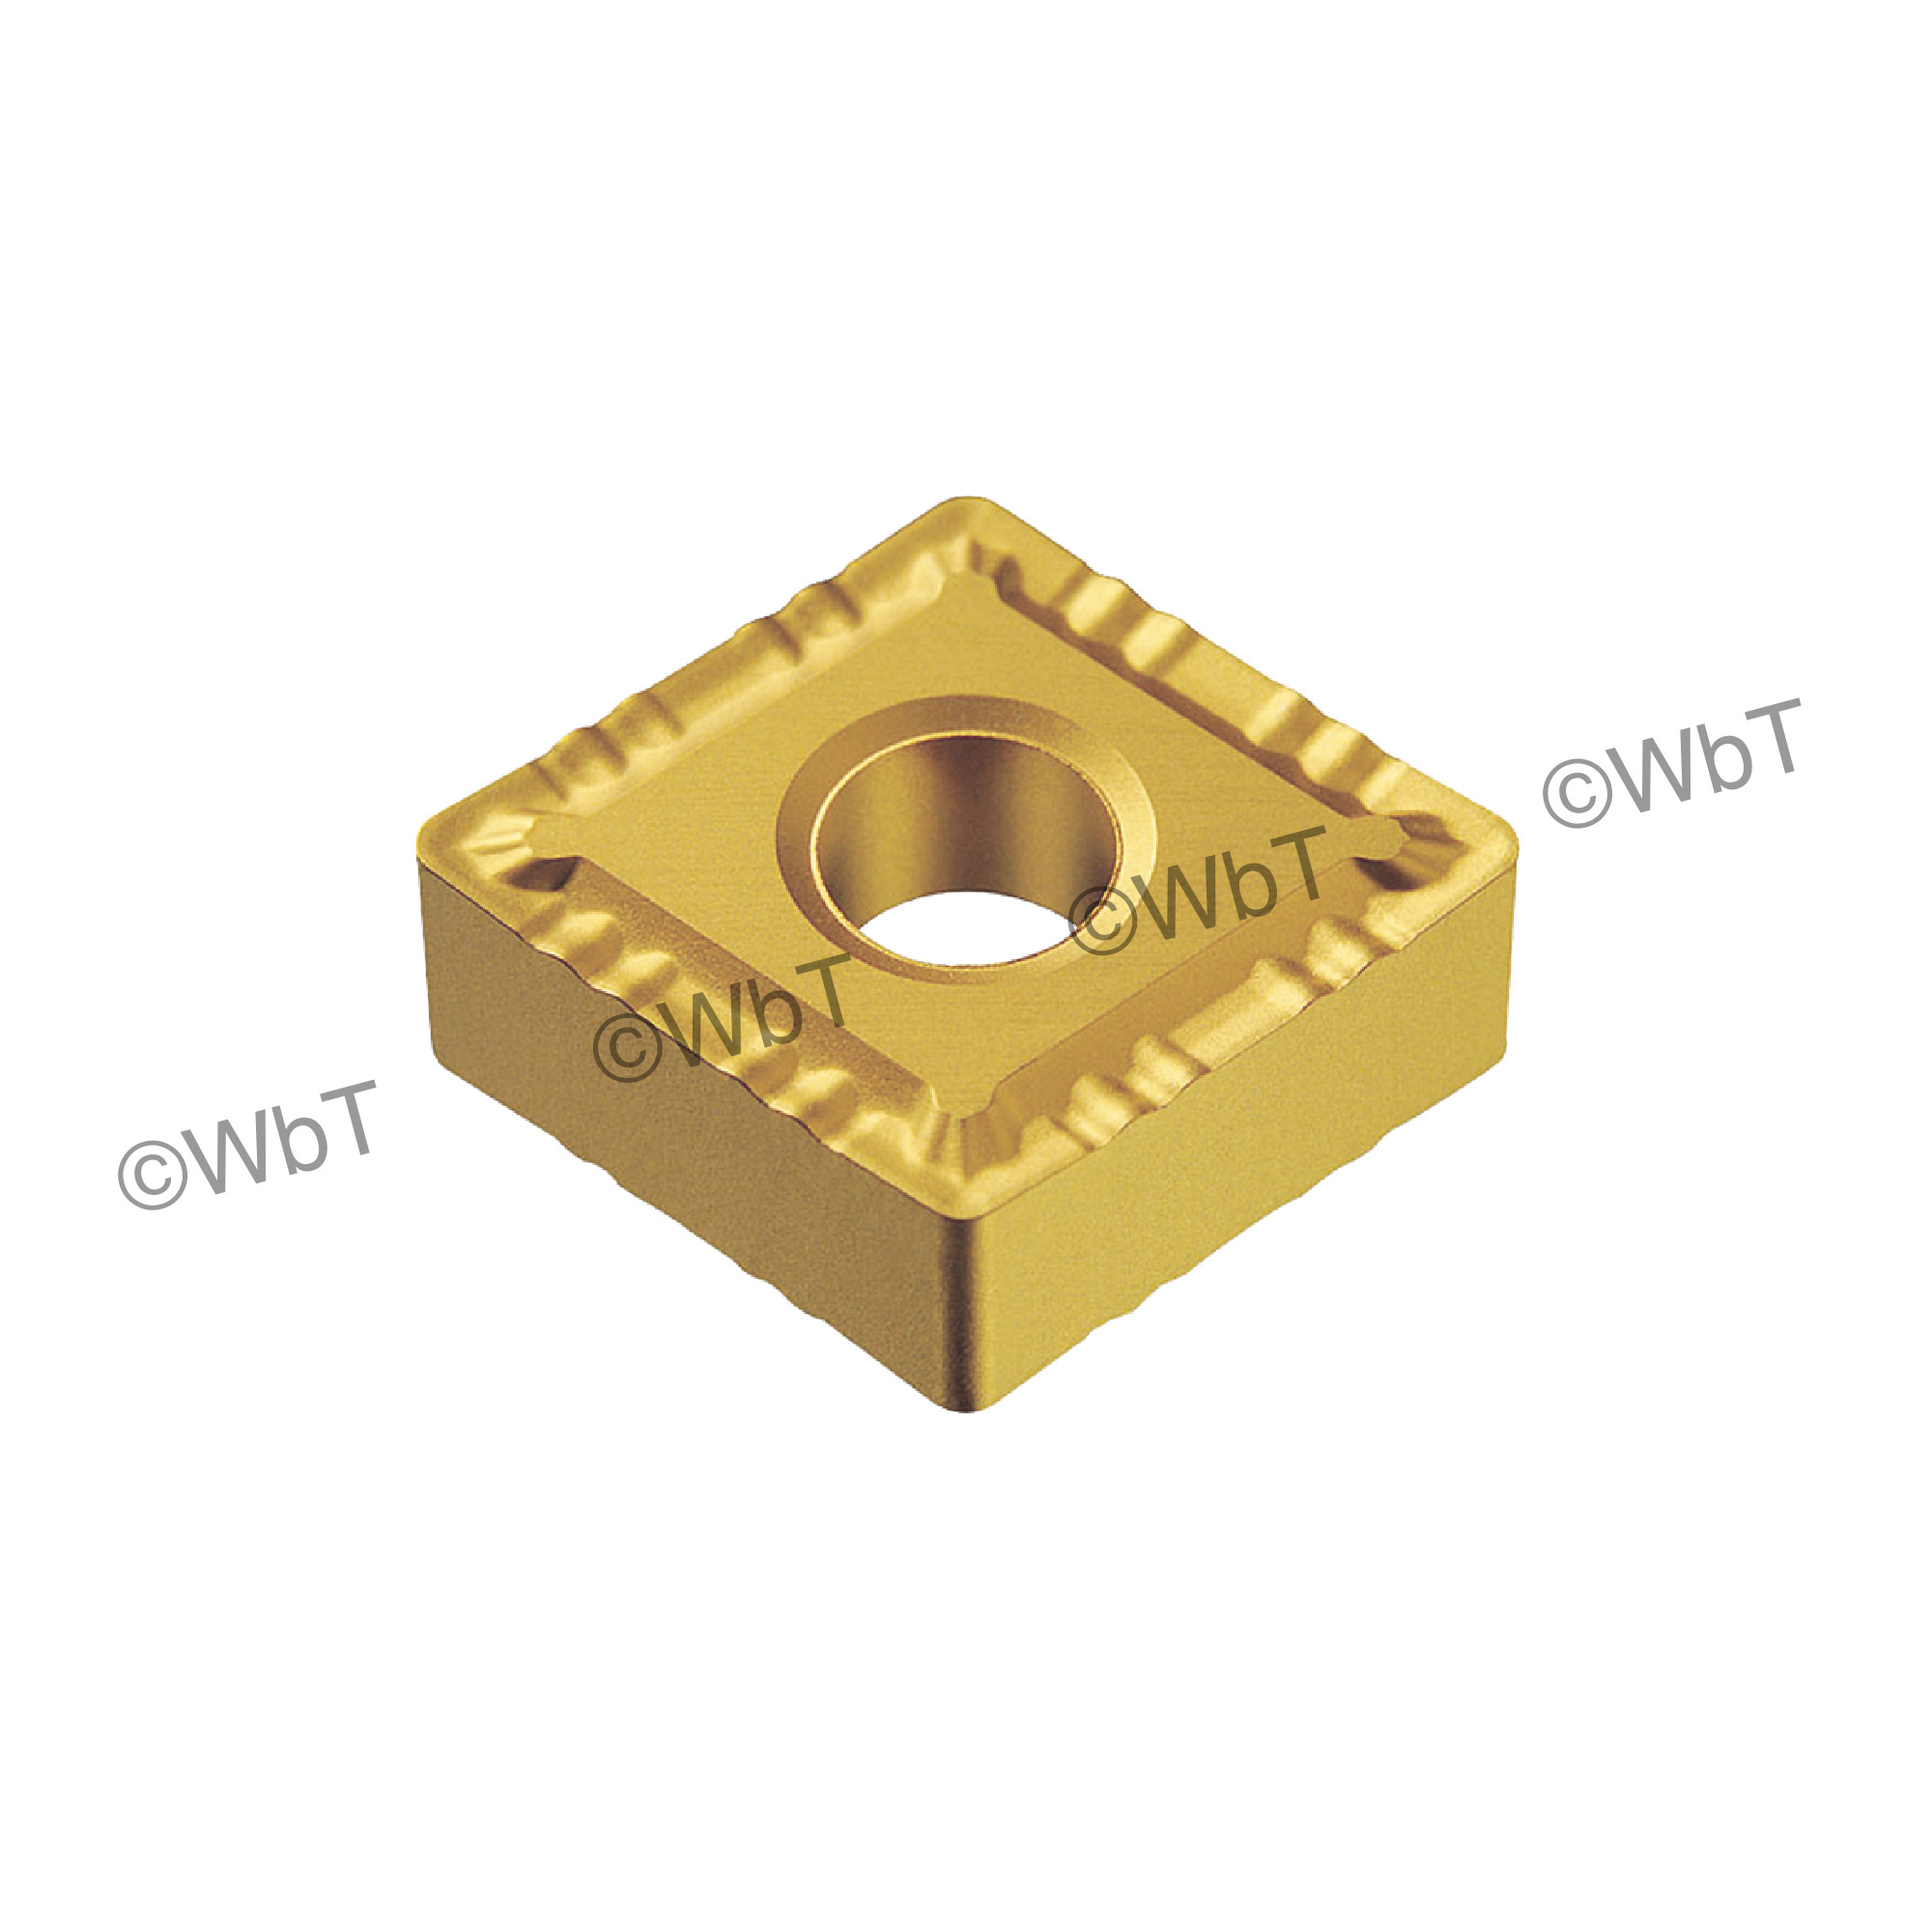 AKUMA - CNMG432-LMP1 CT25M - 80° Diamond / Indexable Carbide Turning Insert